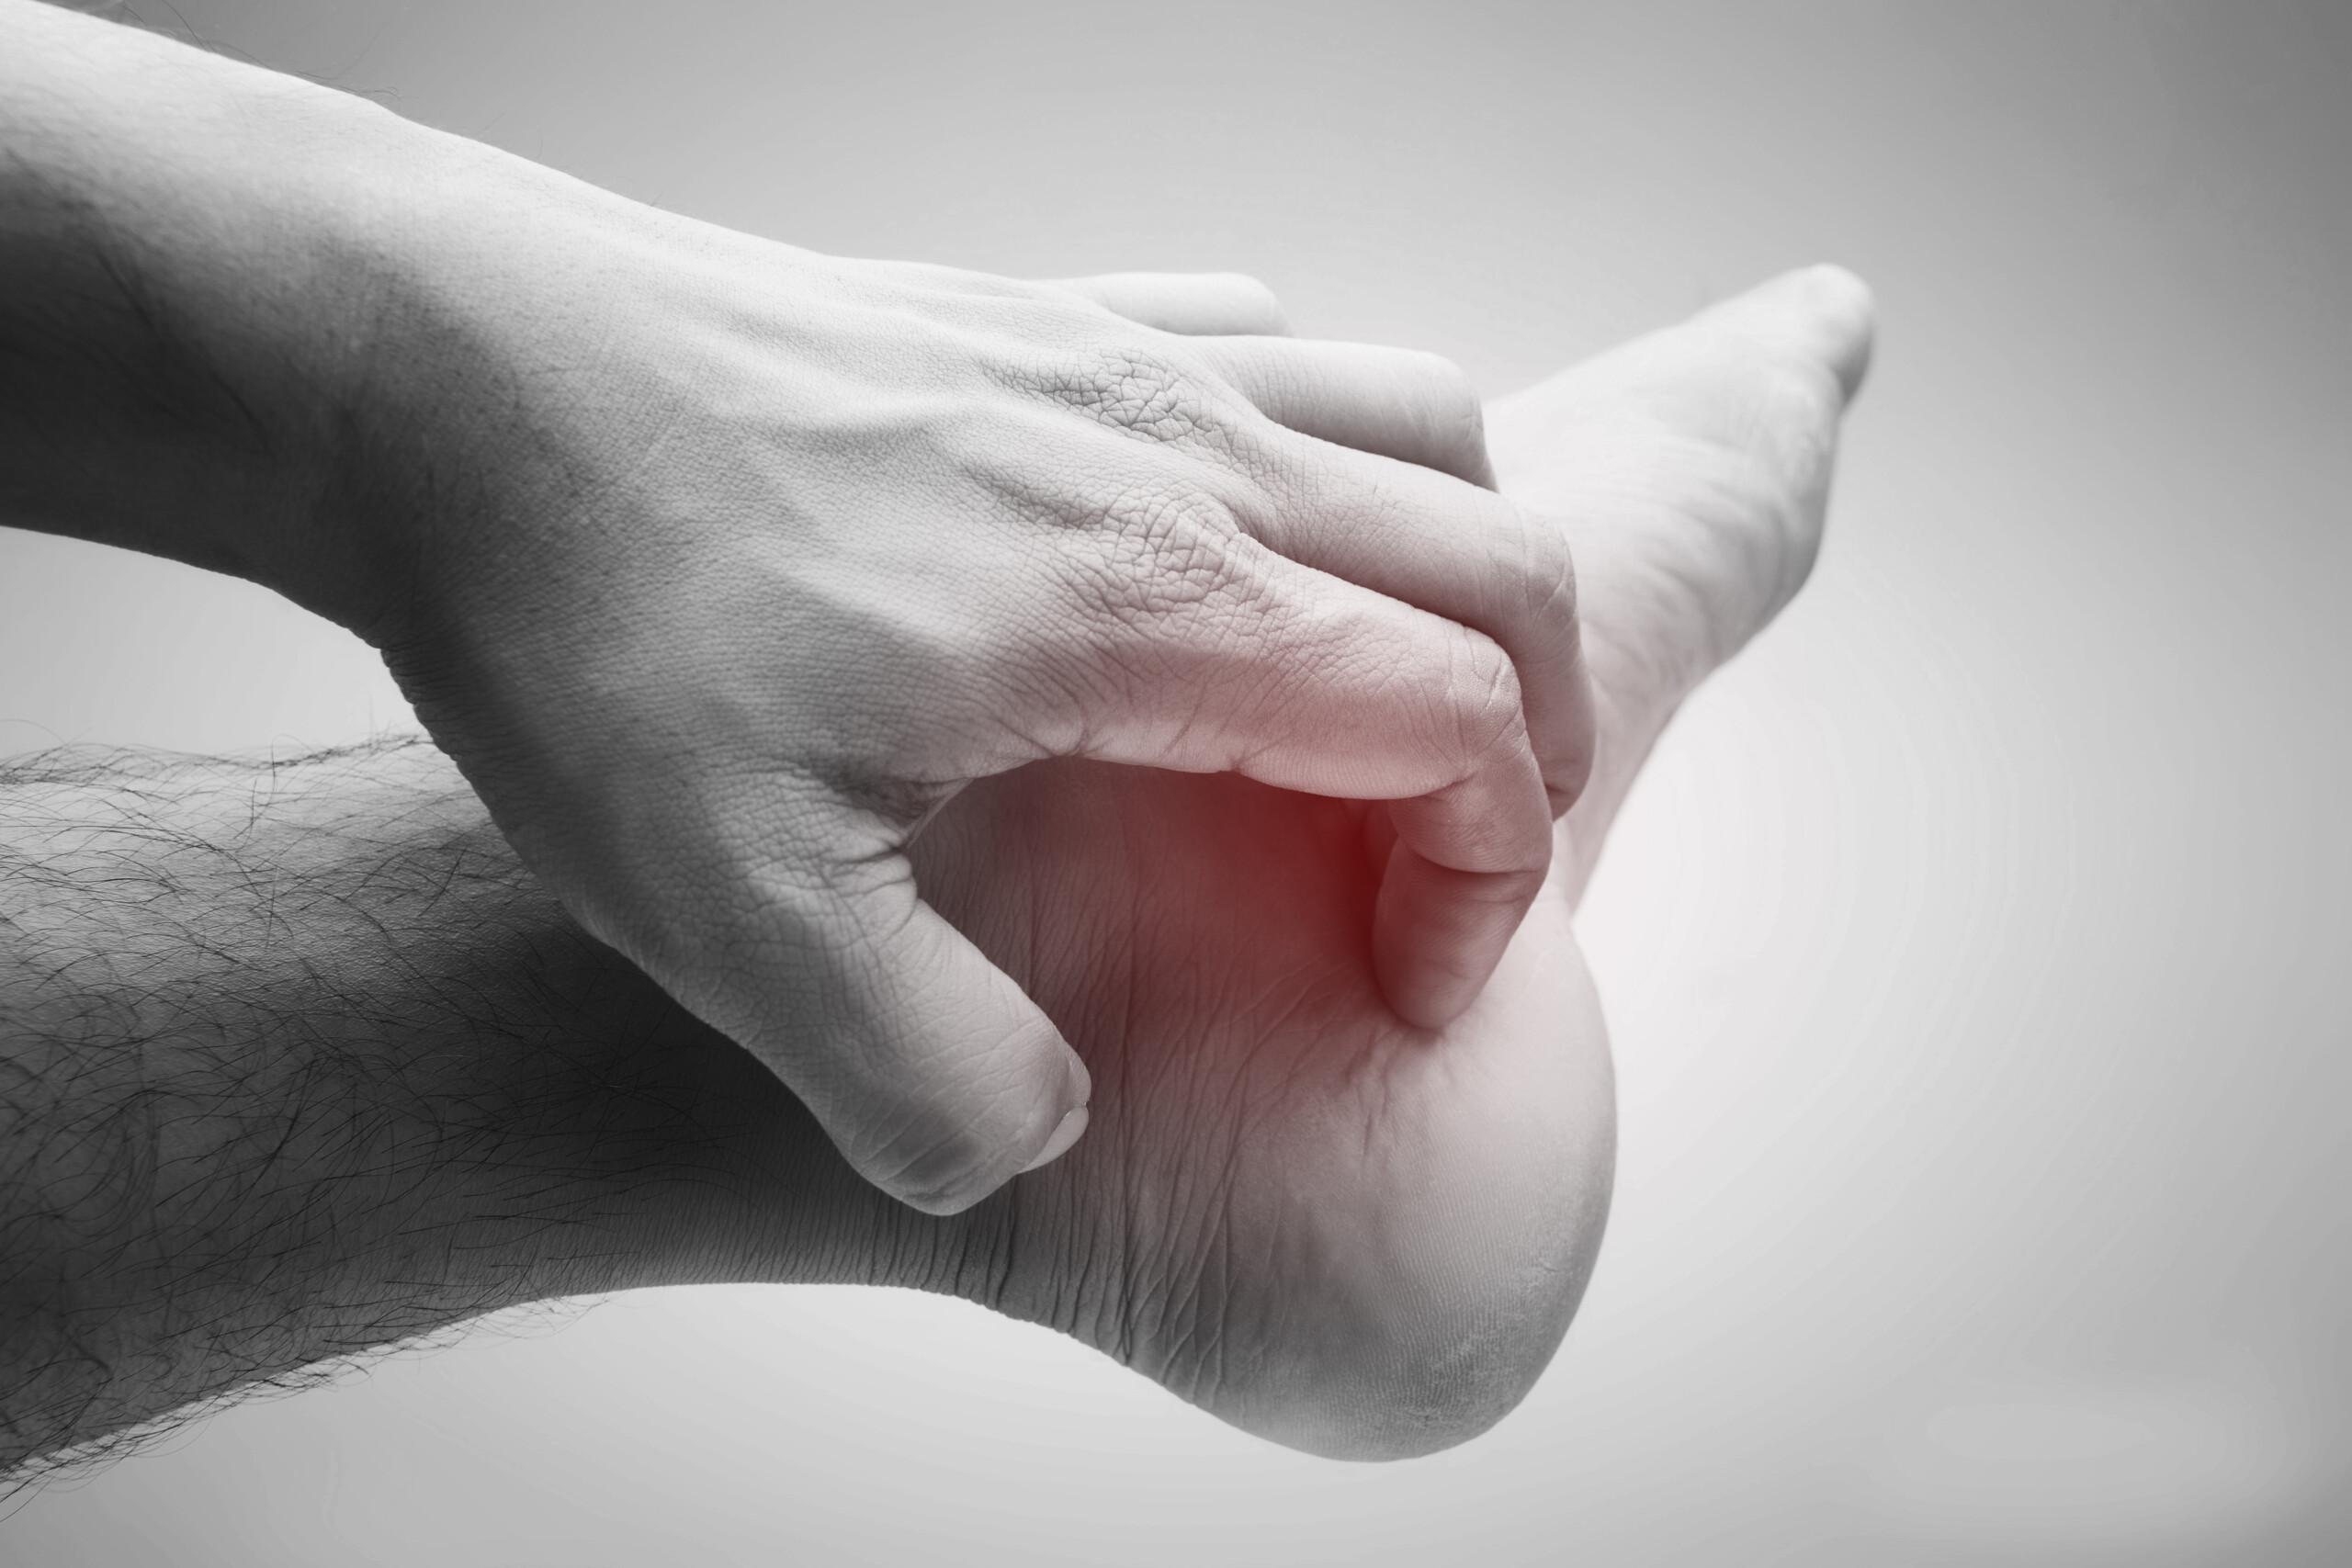 Plantar Fasciitis Pain vs. Heel Spur: Symptom Comparison